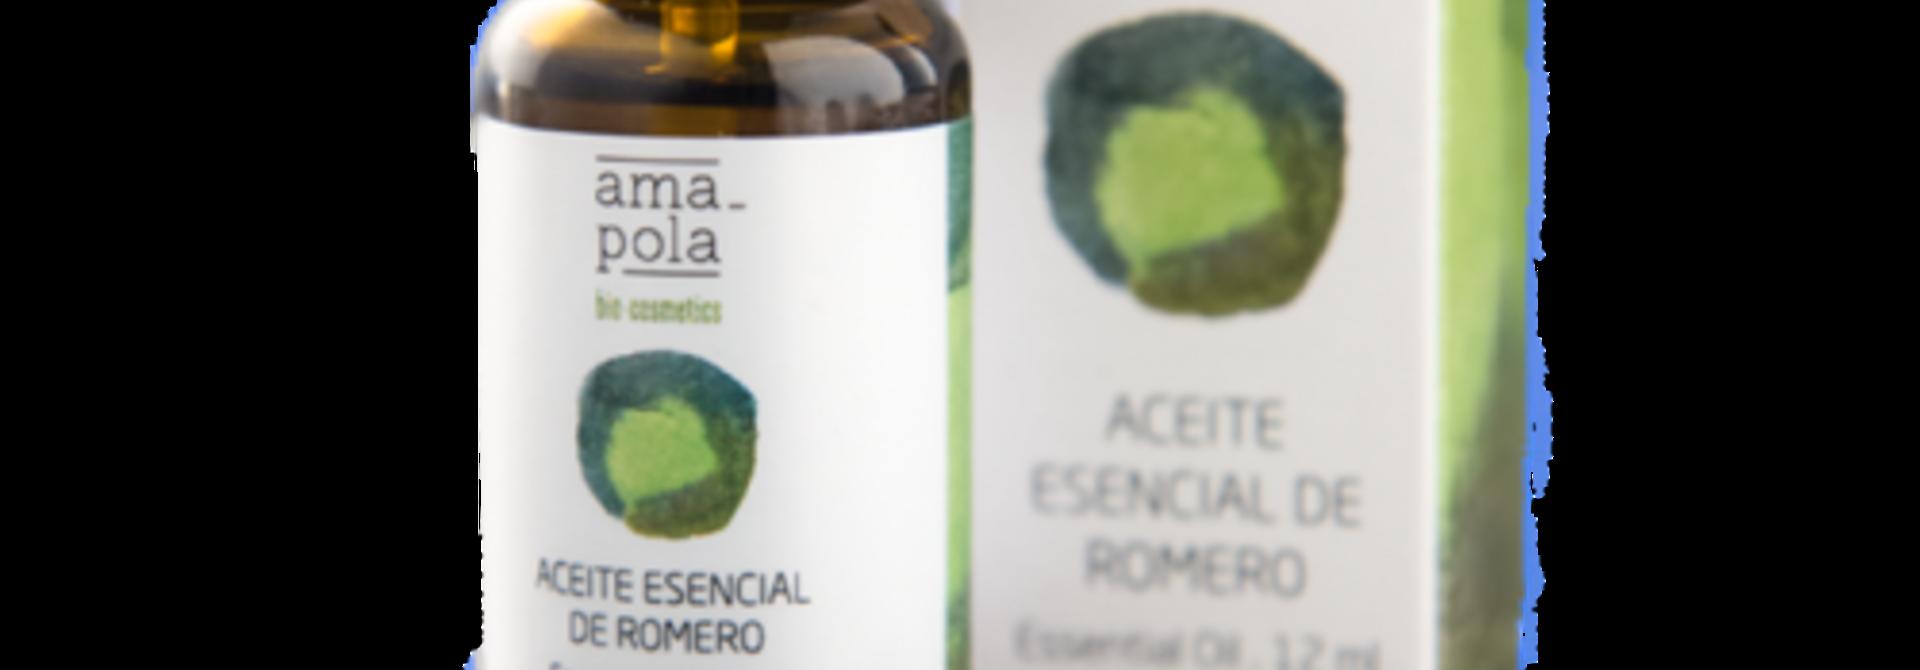 Etherische olie rozemarijn Amapola 12ml